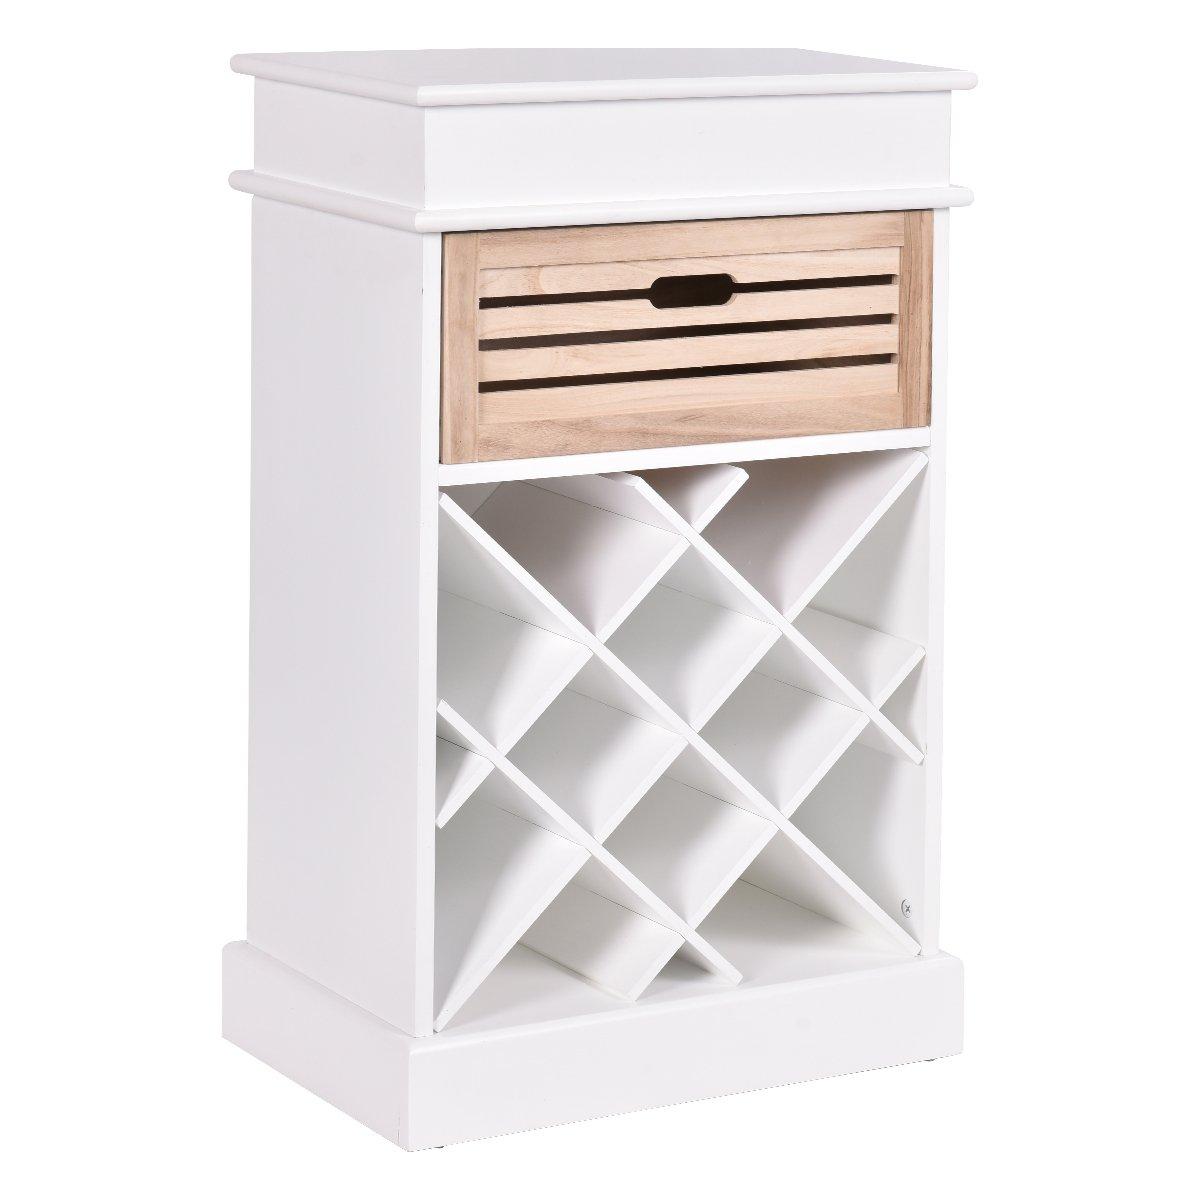 Giantex 12 Bottles Wine Rack Cabinet Storage Display Shelves Wood Kitchen Decor White (White)